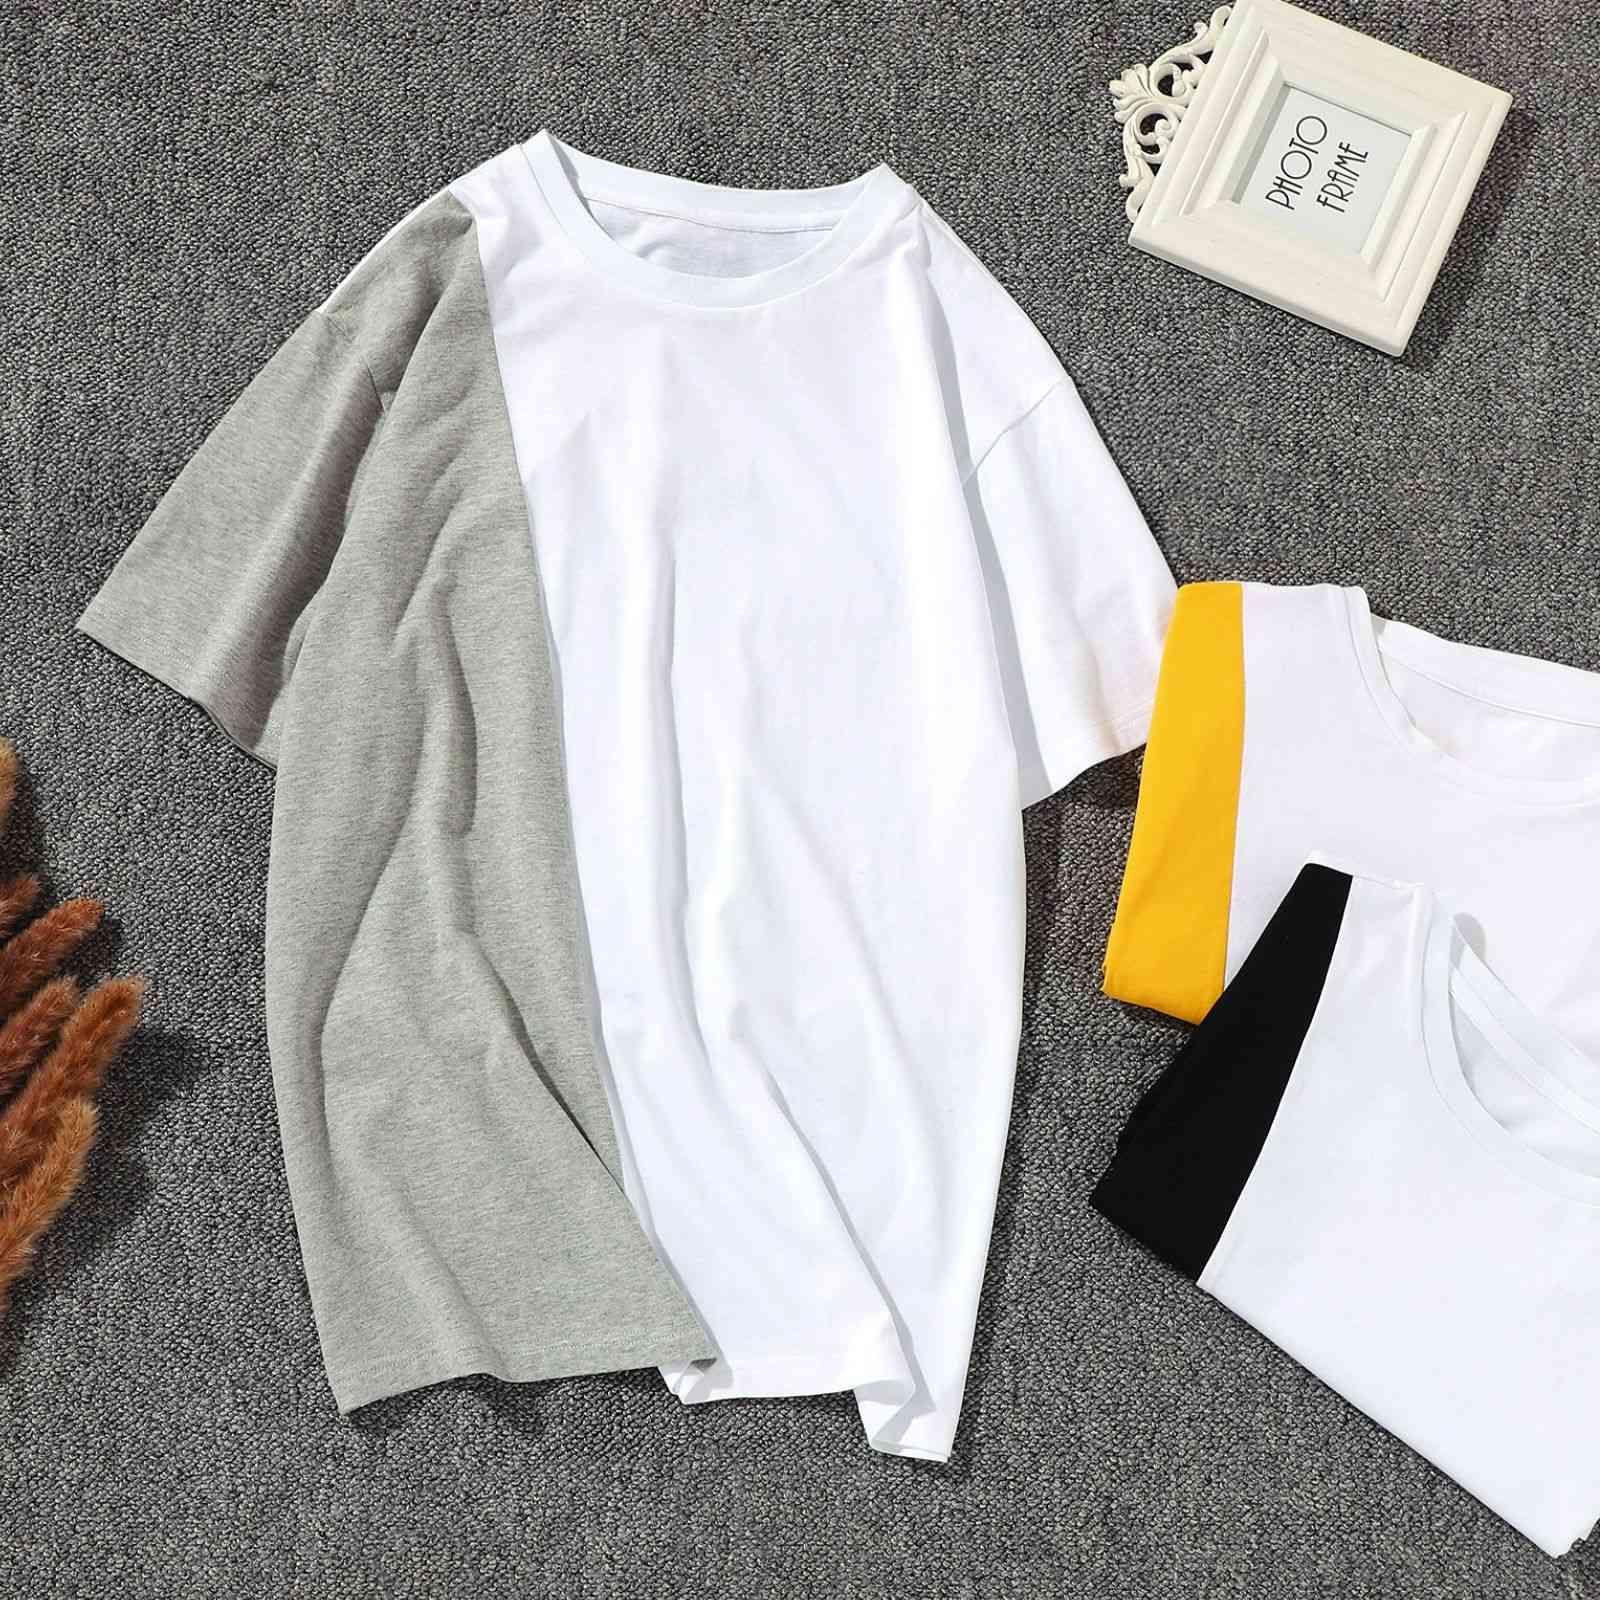 T-shirt Ruixin 2021 Summer Pure Cotton Lovers Brand Slip Split Slip Manica Corta T-shirt T-shirt